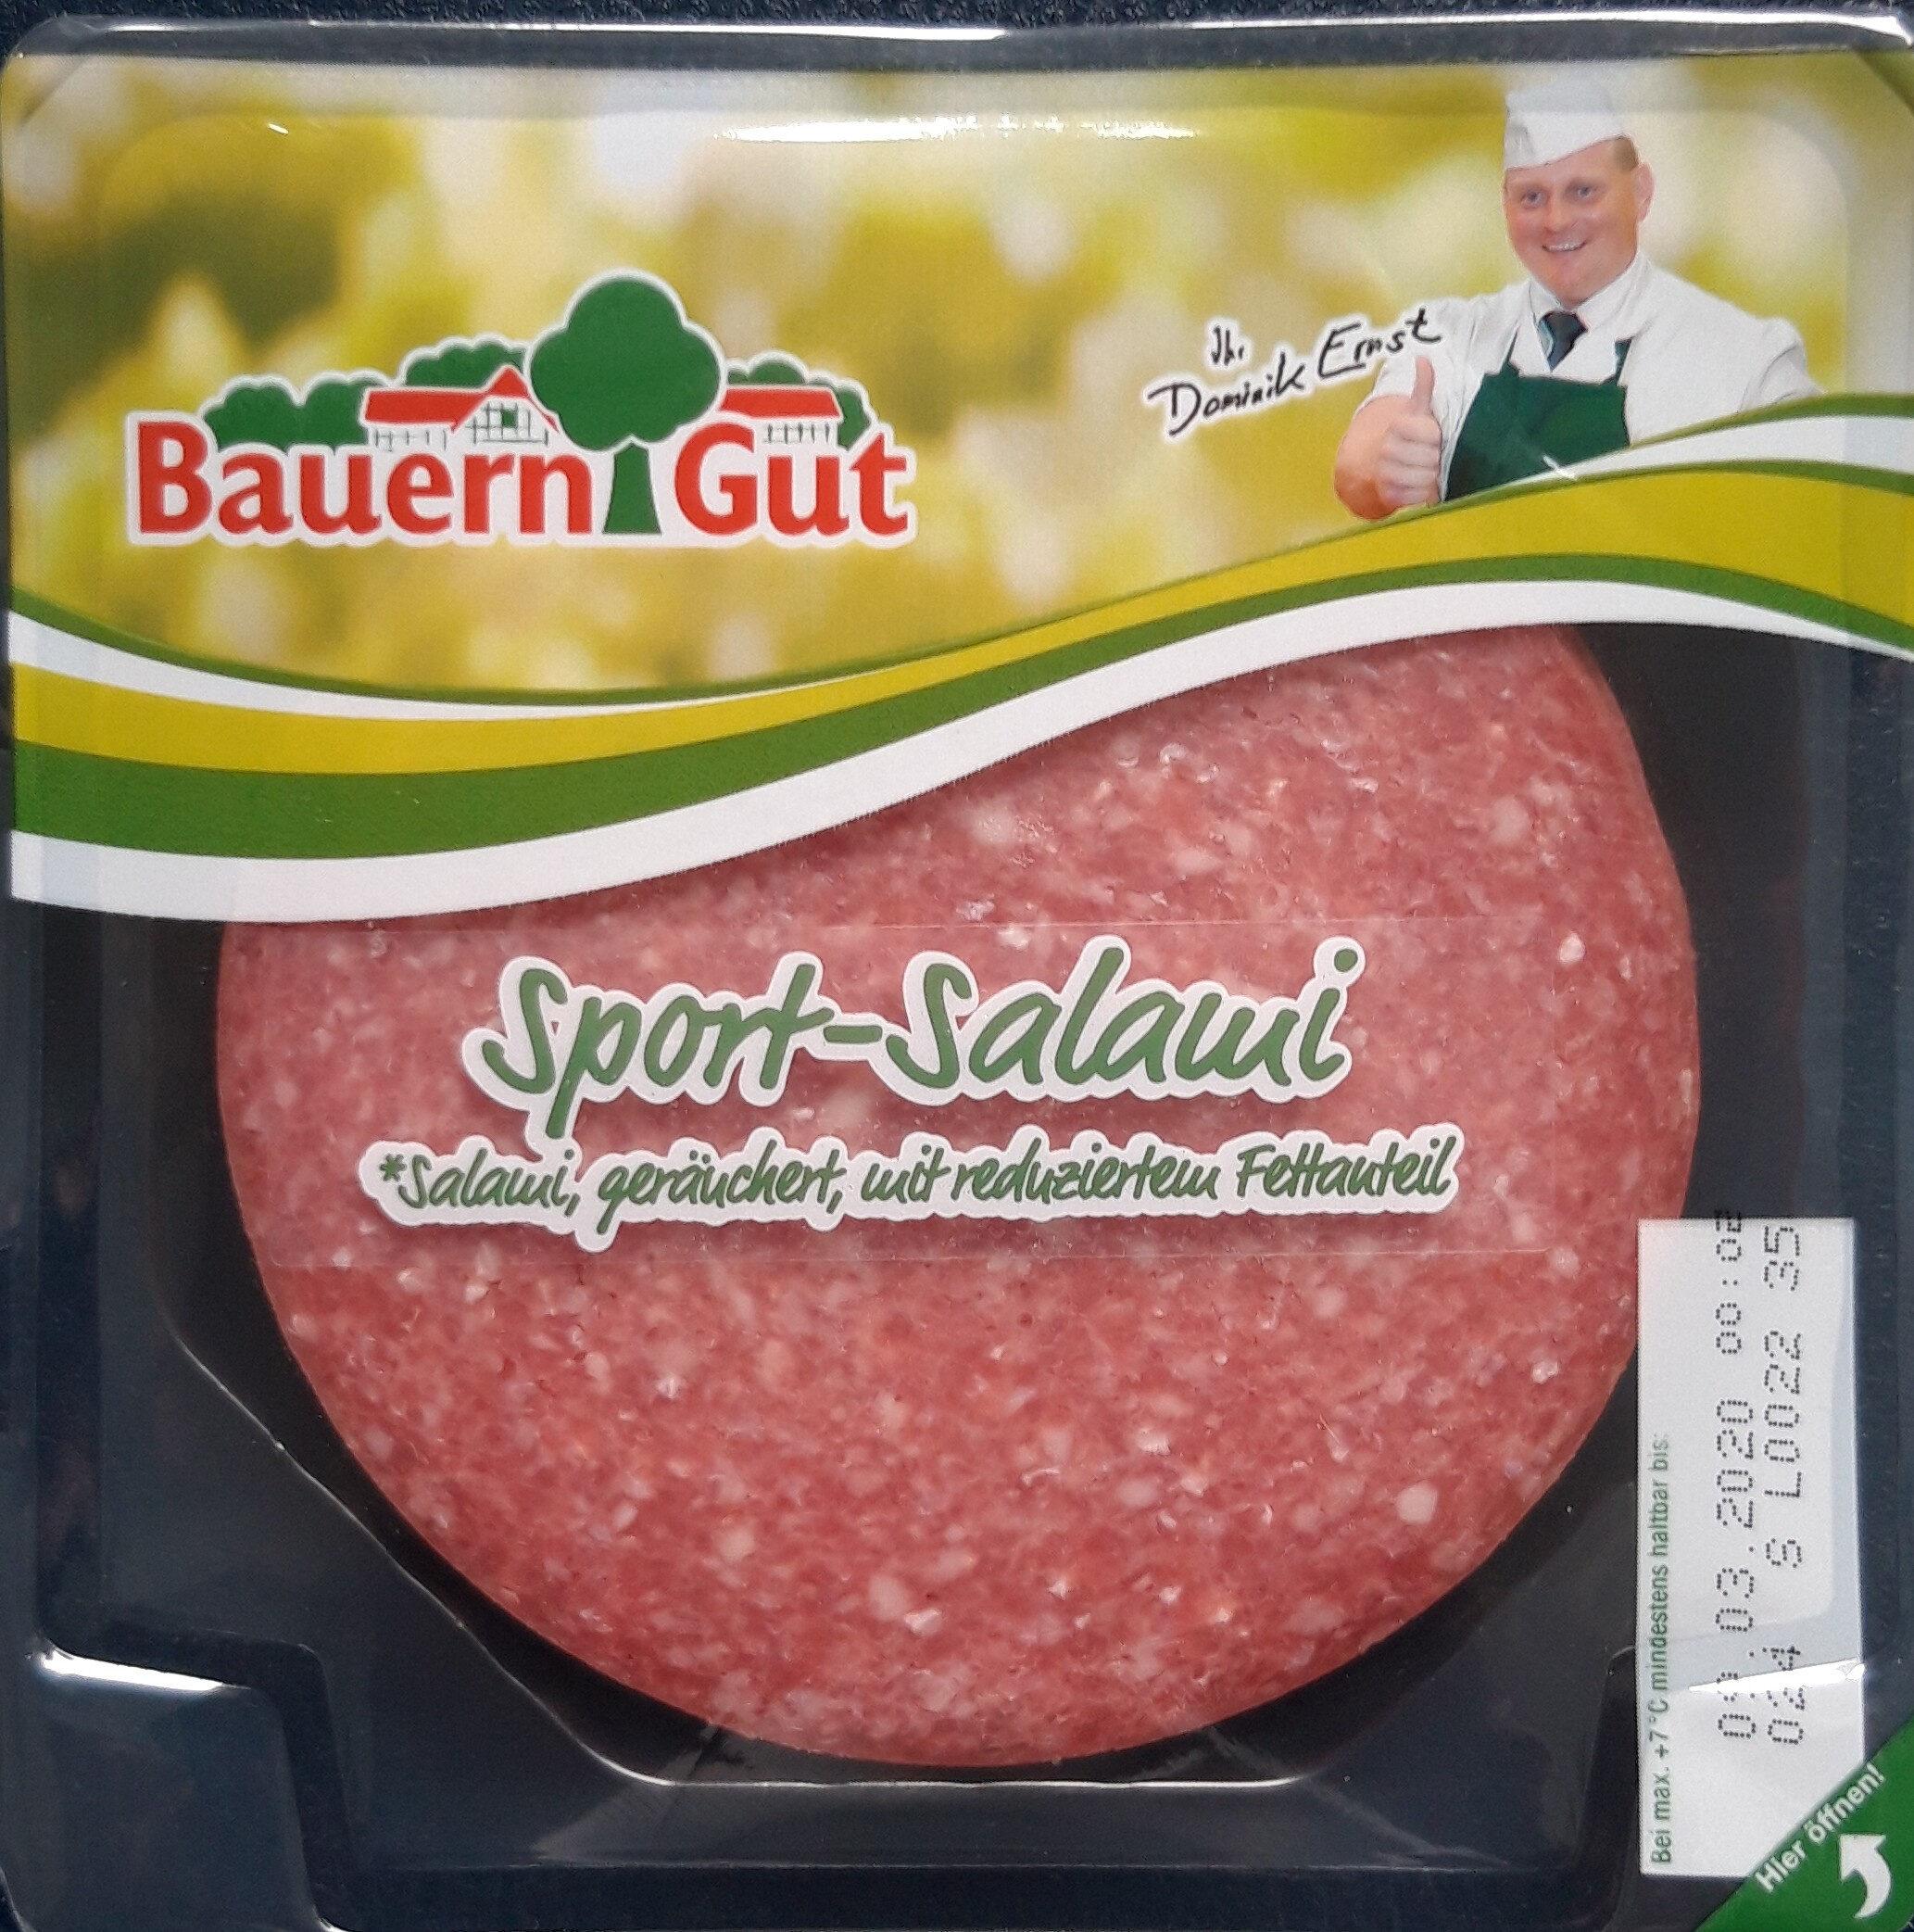 Sport-Salami - Product - de